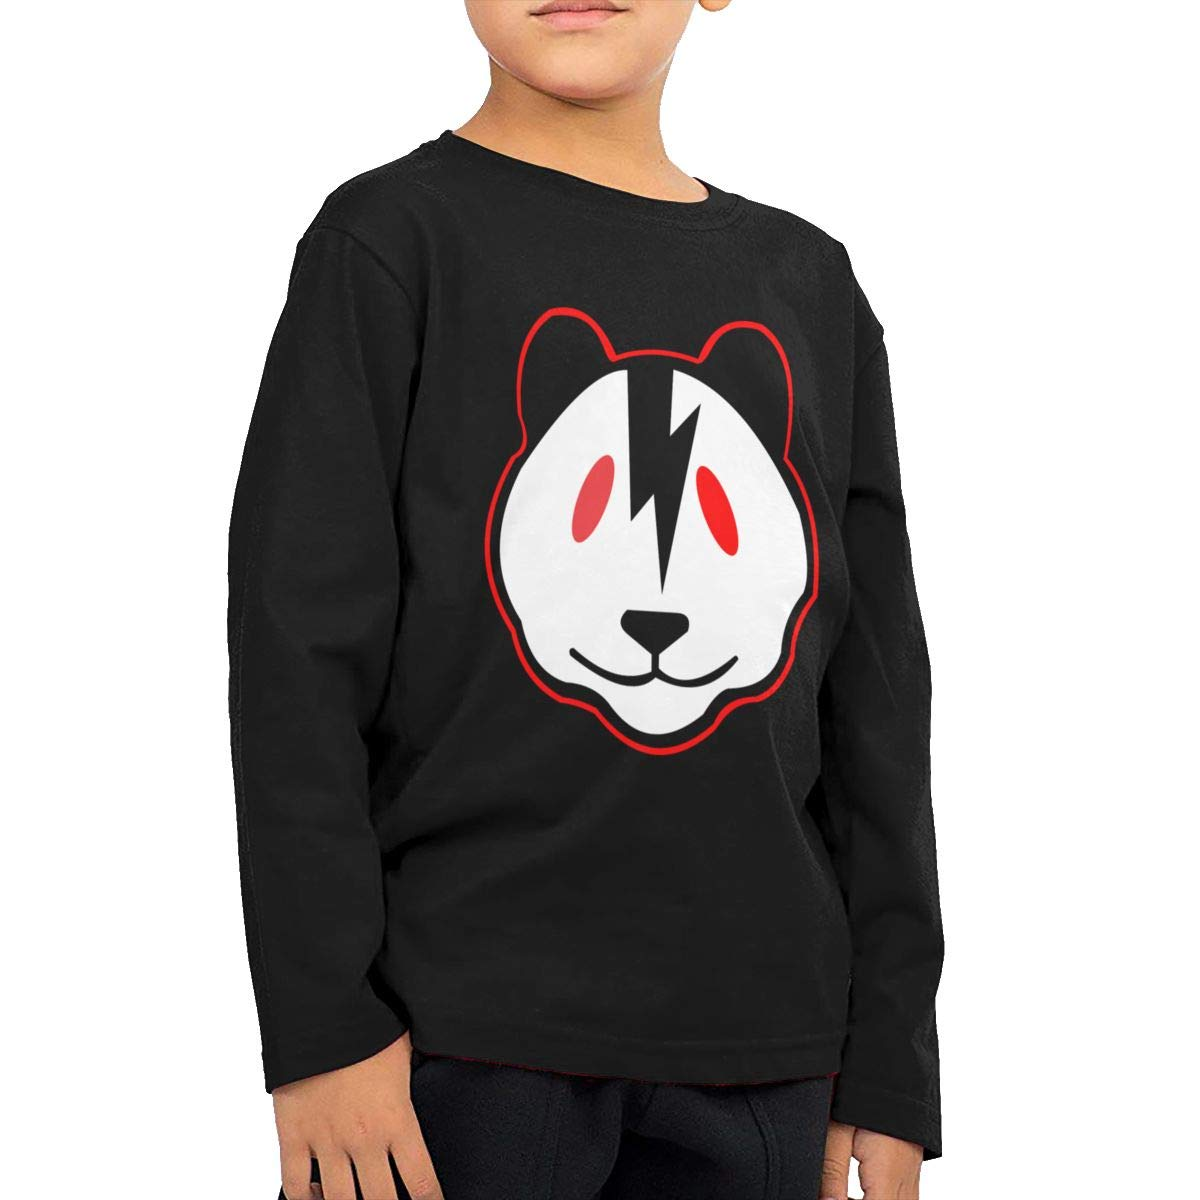 Rhfjgk Ldjg Bear Face with Lightning Youth Boys Long Sleeve Tees Cotton